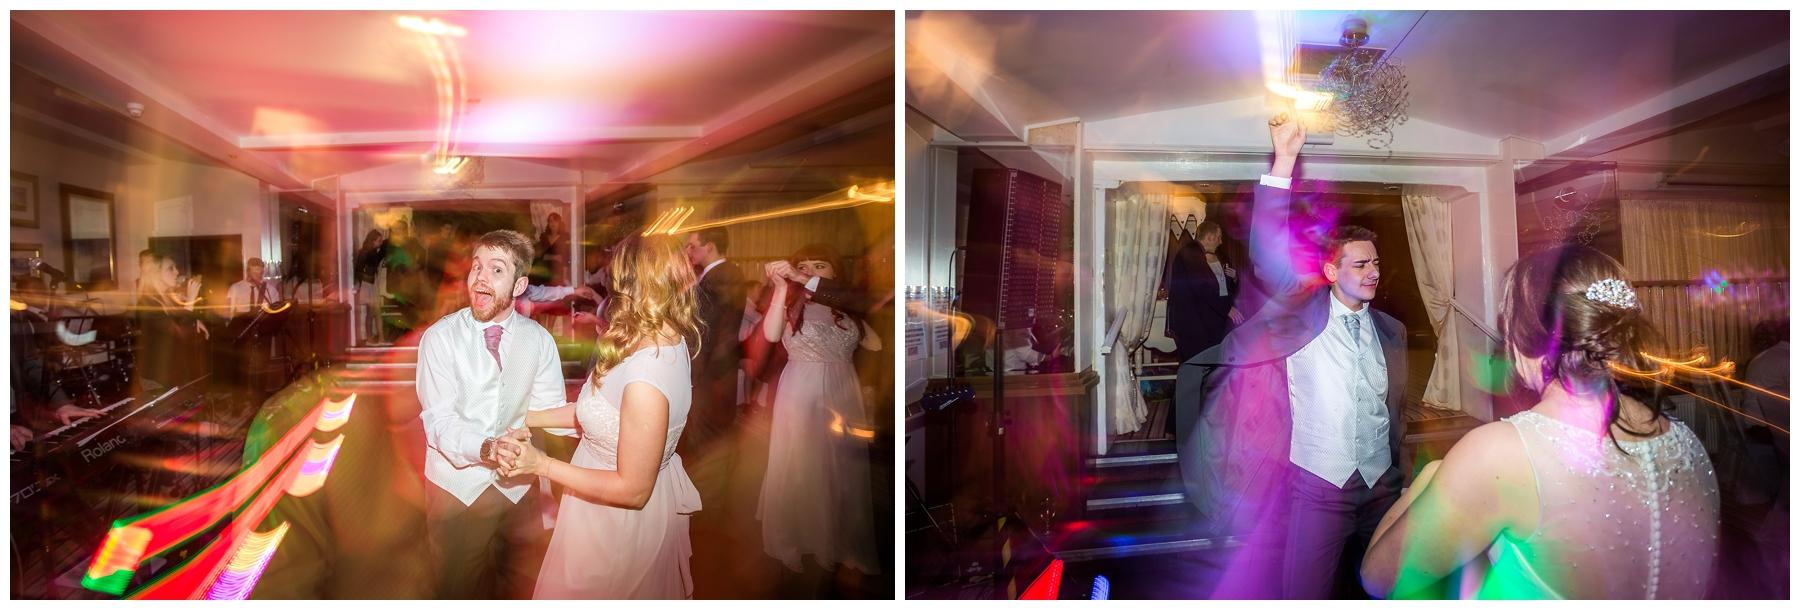 holland-hall-wedding-photography-becky-jason_0054.jpg